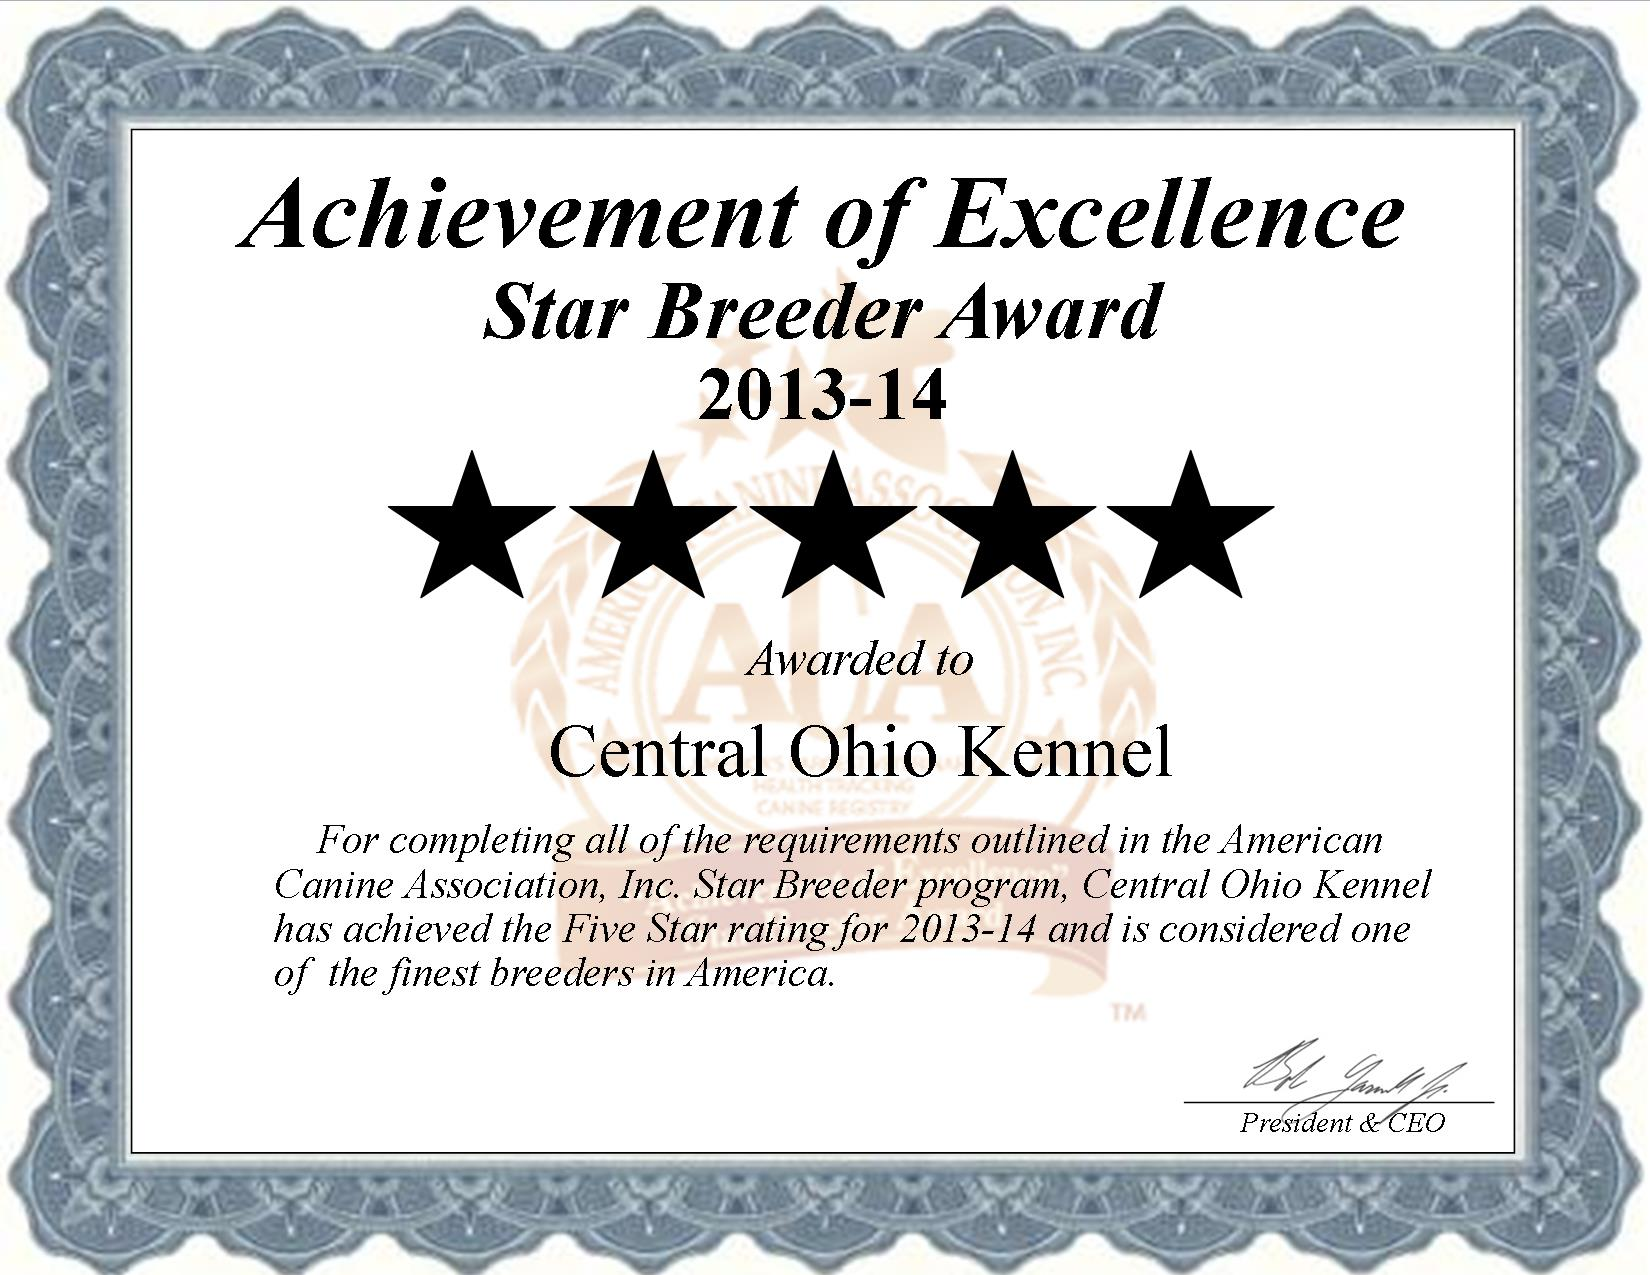 Central Ohio kennel, Central, Kennel, Central Kennel, Central Ohio Kennels, breeder, star breeder, aca, star breeder, 5 star, Baltic, Ohio, oh, Mifflinburg, dog show, shows, show, champion, champions, stud, service, stud service, dog, puppy, puppies, dog breeder, dog breeders, Ohio breeder, ohio dog breedesr, starbreeder, 5 star breeders, aca 5 star breeders, certificate